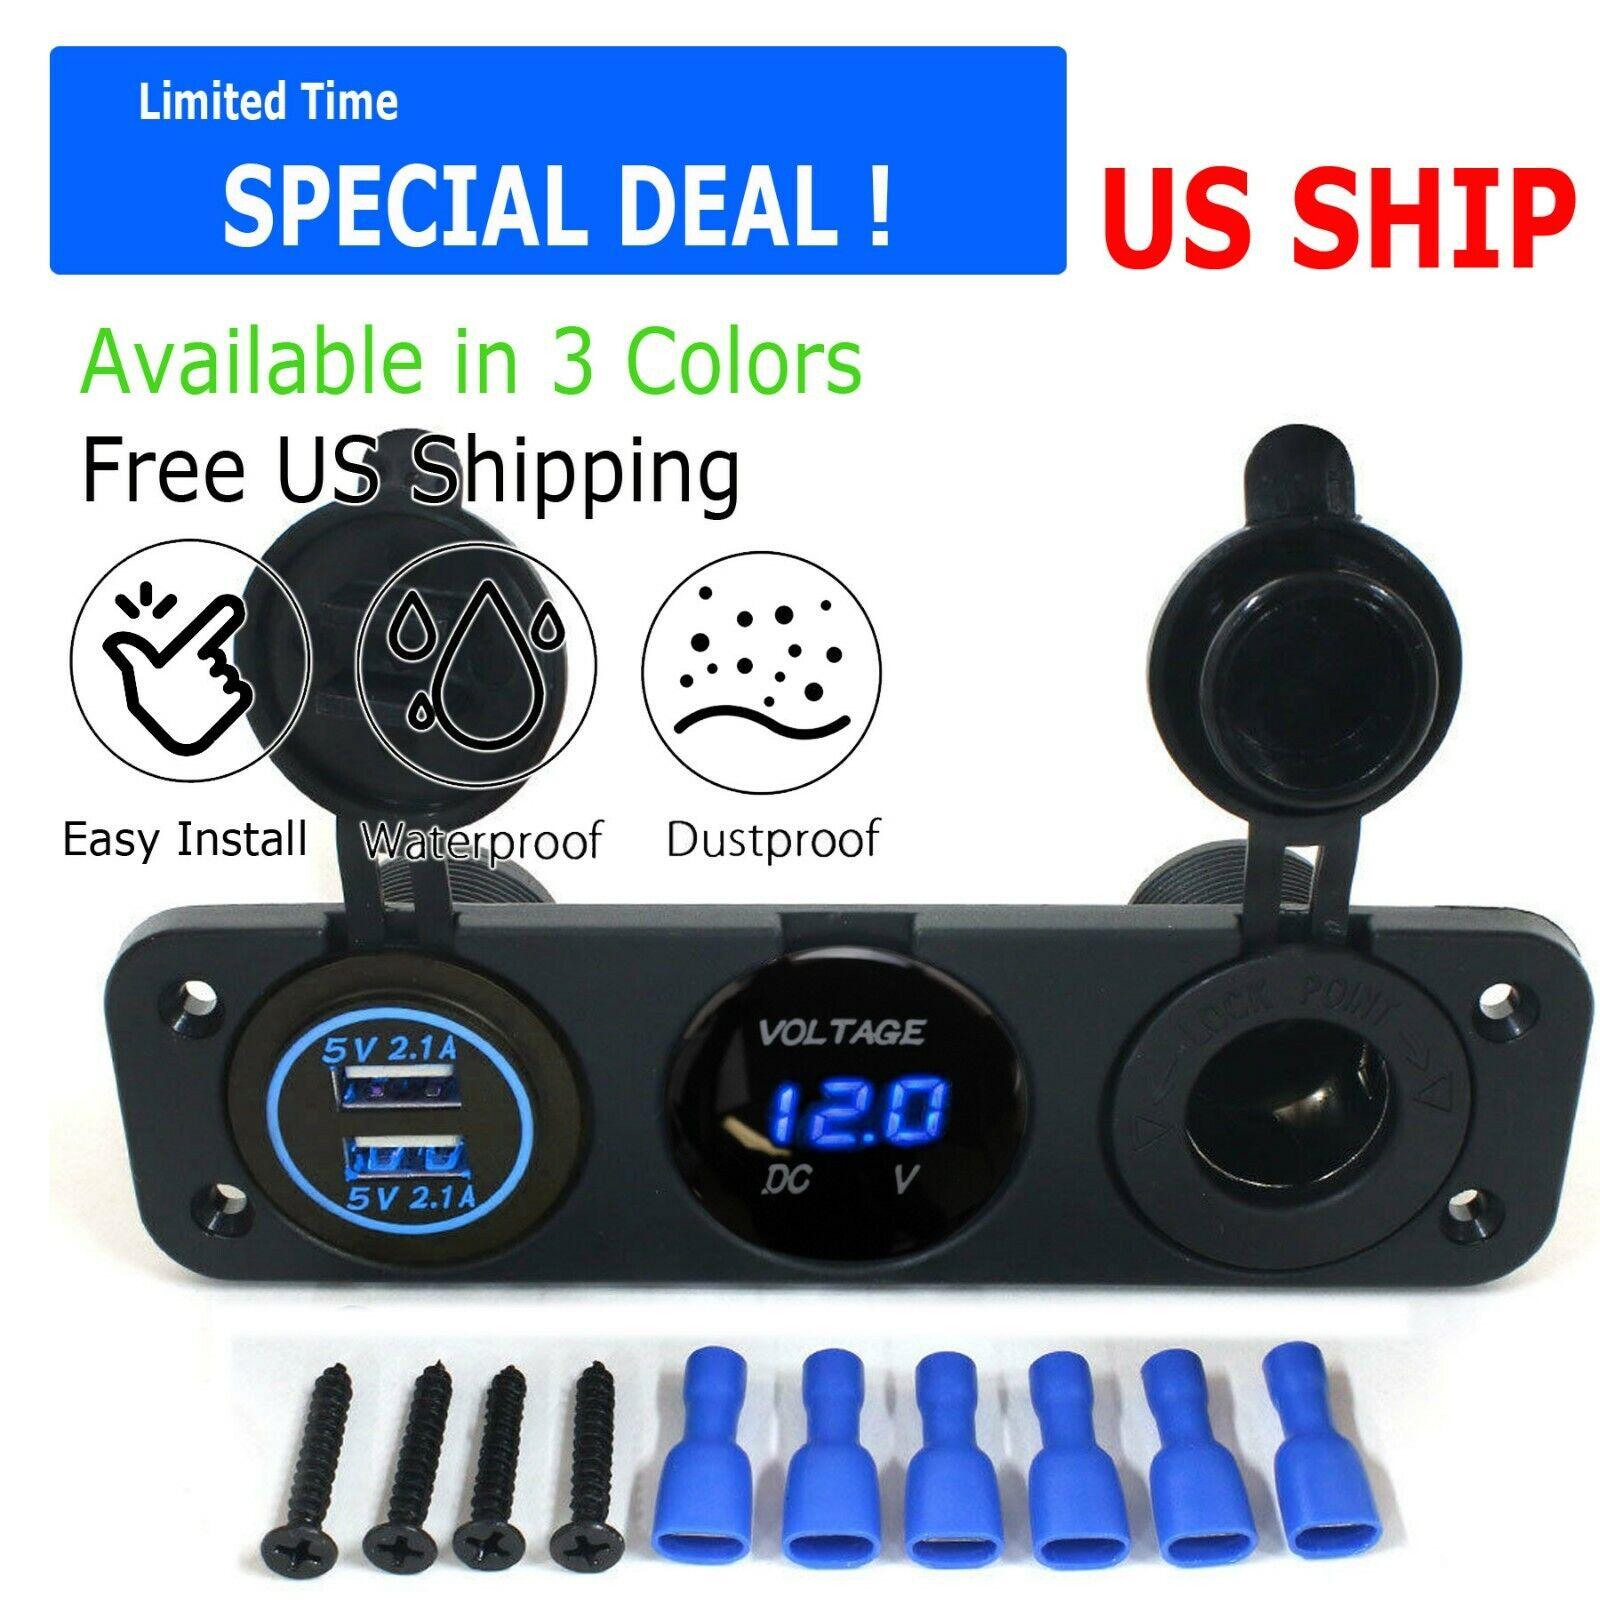 3.1A USB Dual Ports Car Cigarette Lighter Charger 12V/24V Di